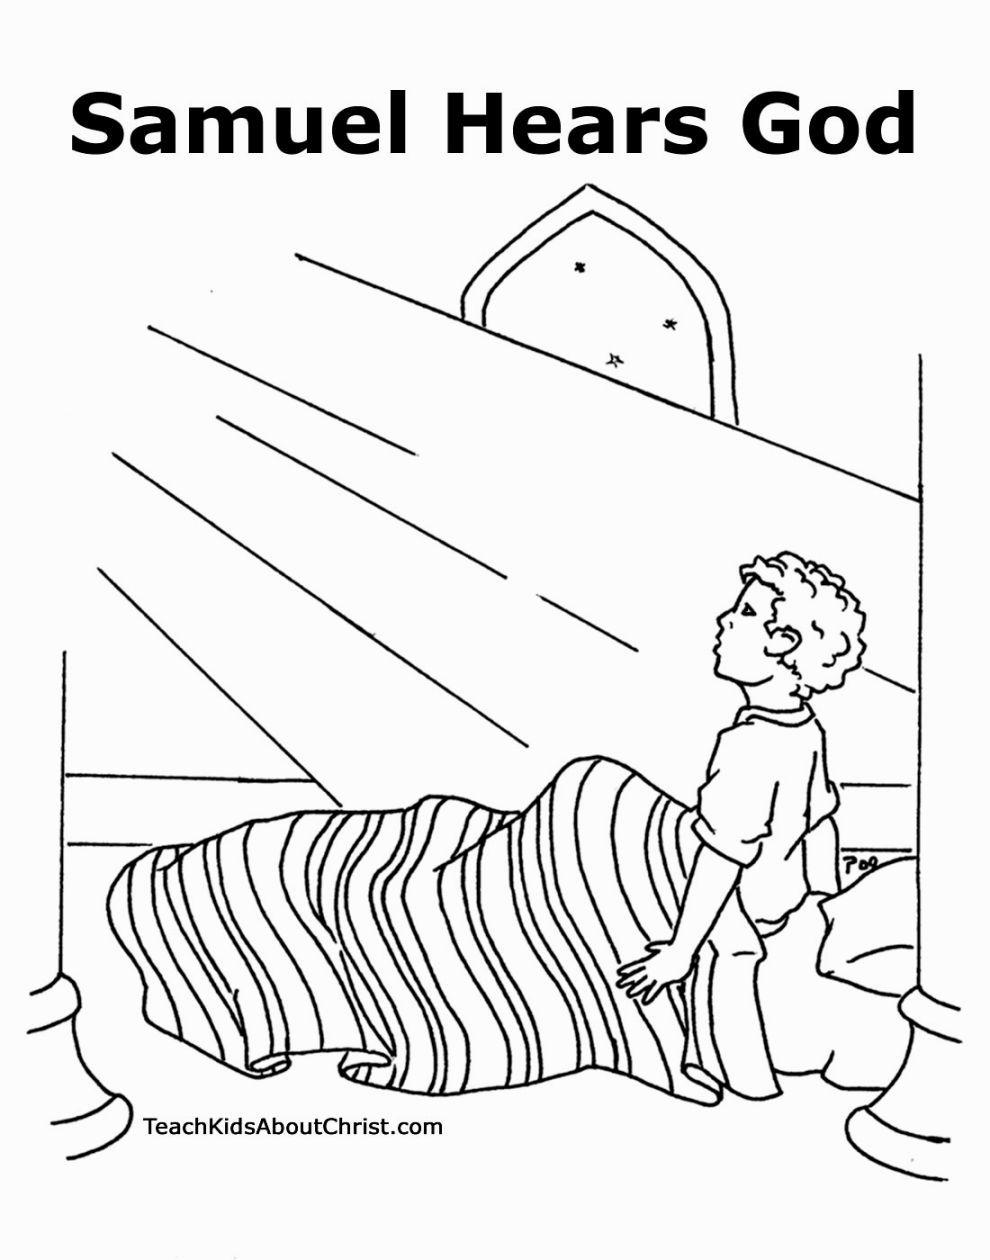 Samuel Coloring Pages : samuel, coloring, pages, Samuel, Coloring, Bible,, Bible, Story,, Pages